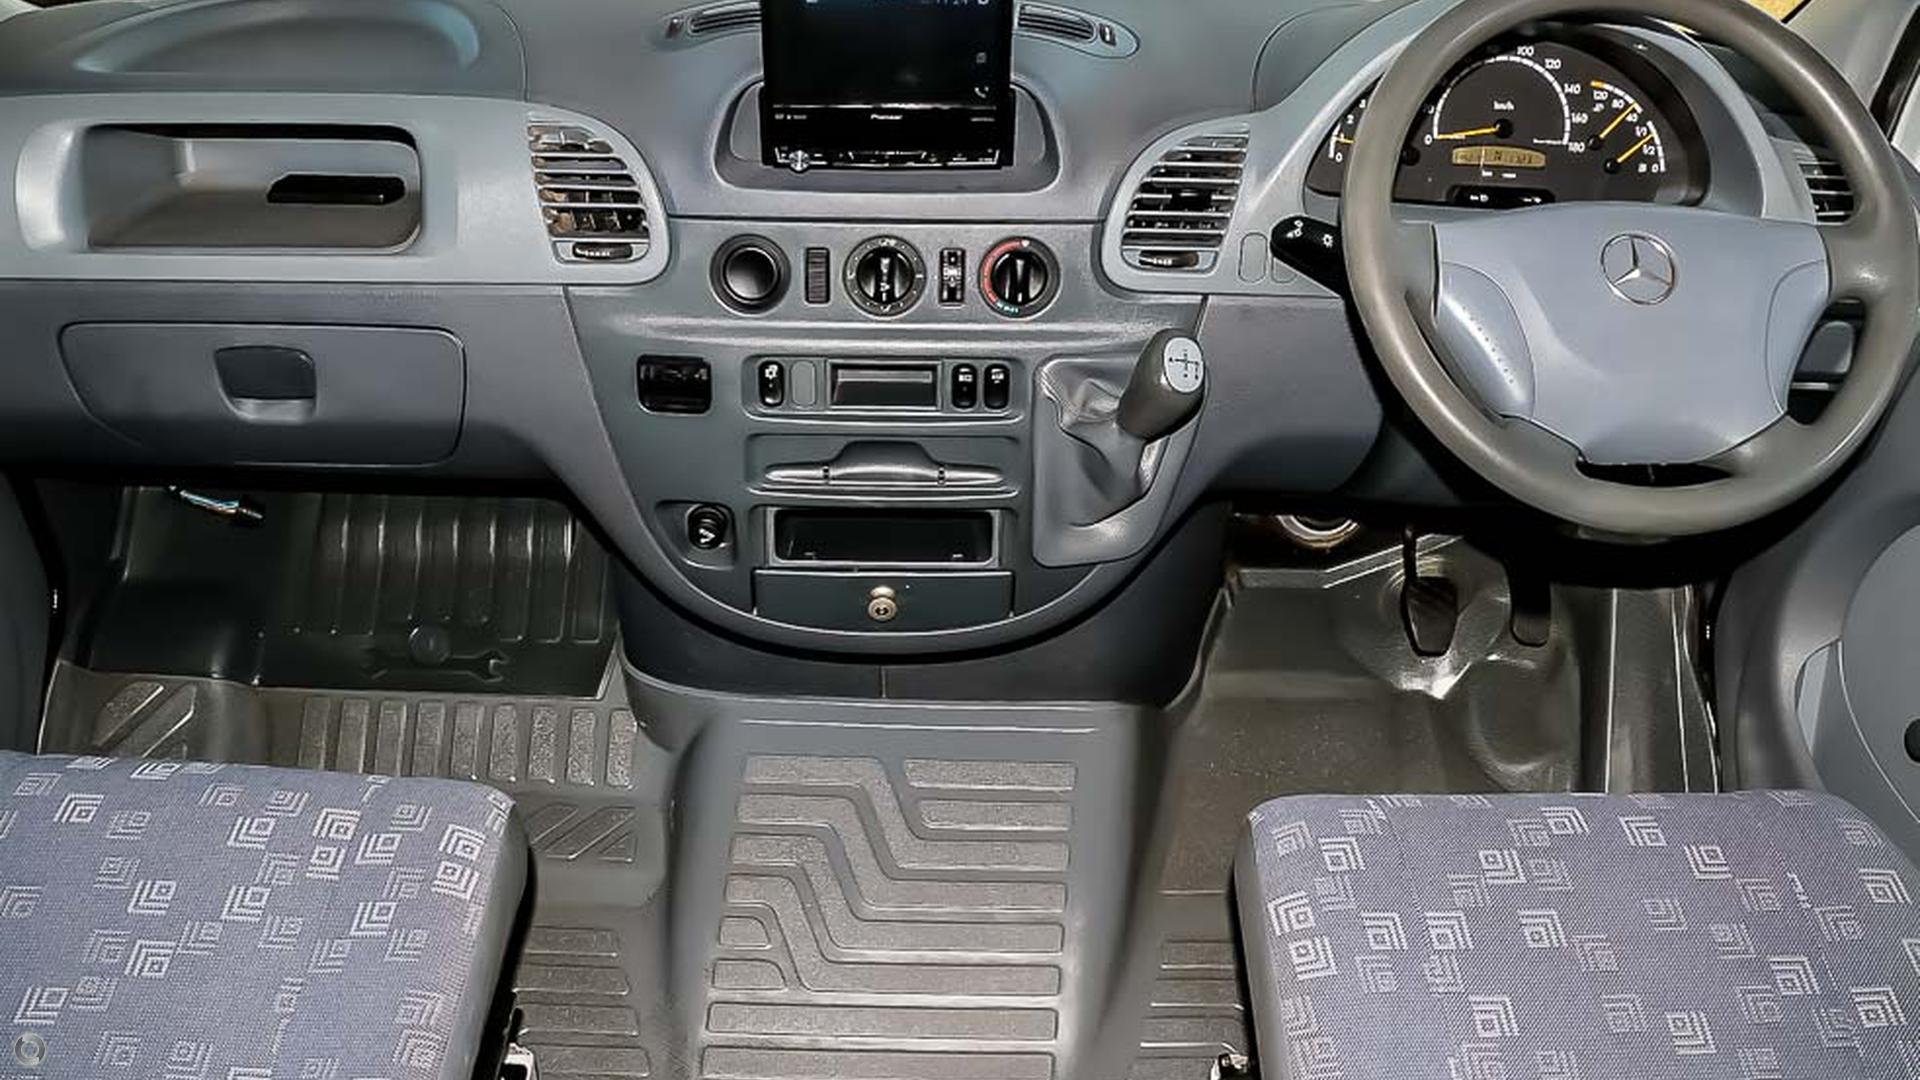 2003 Mercedes Cdi 6 Berth Motorhome